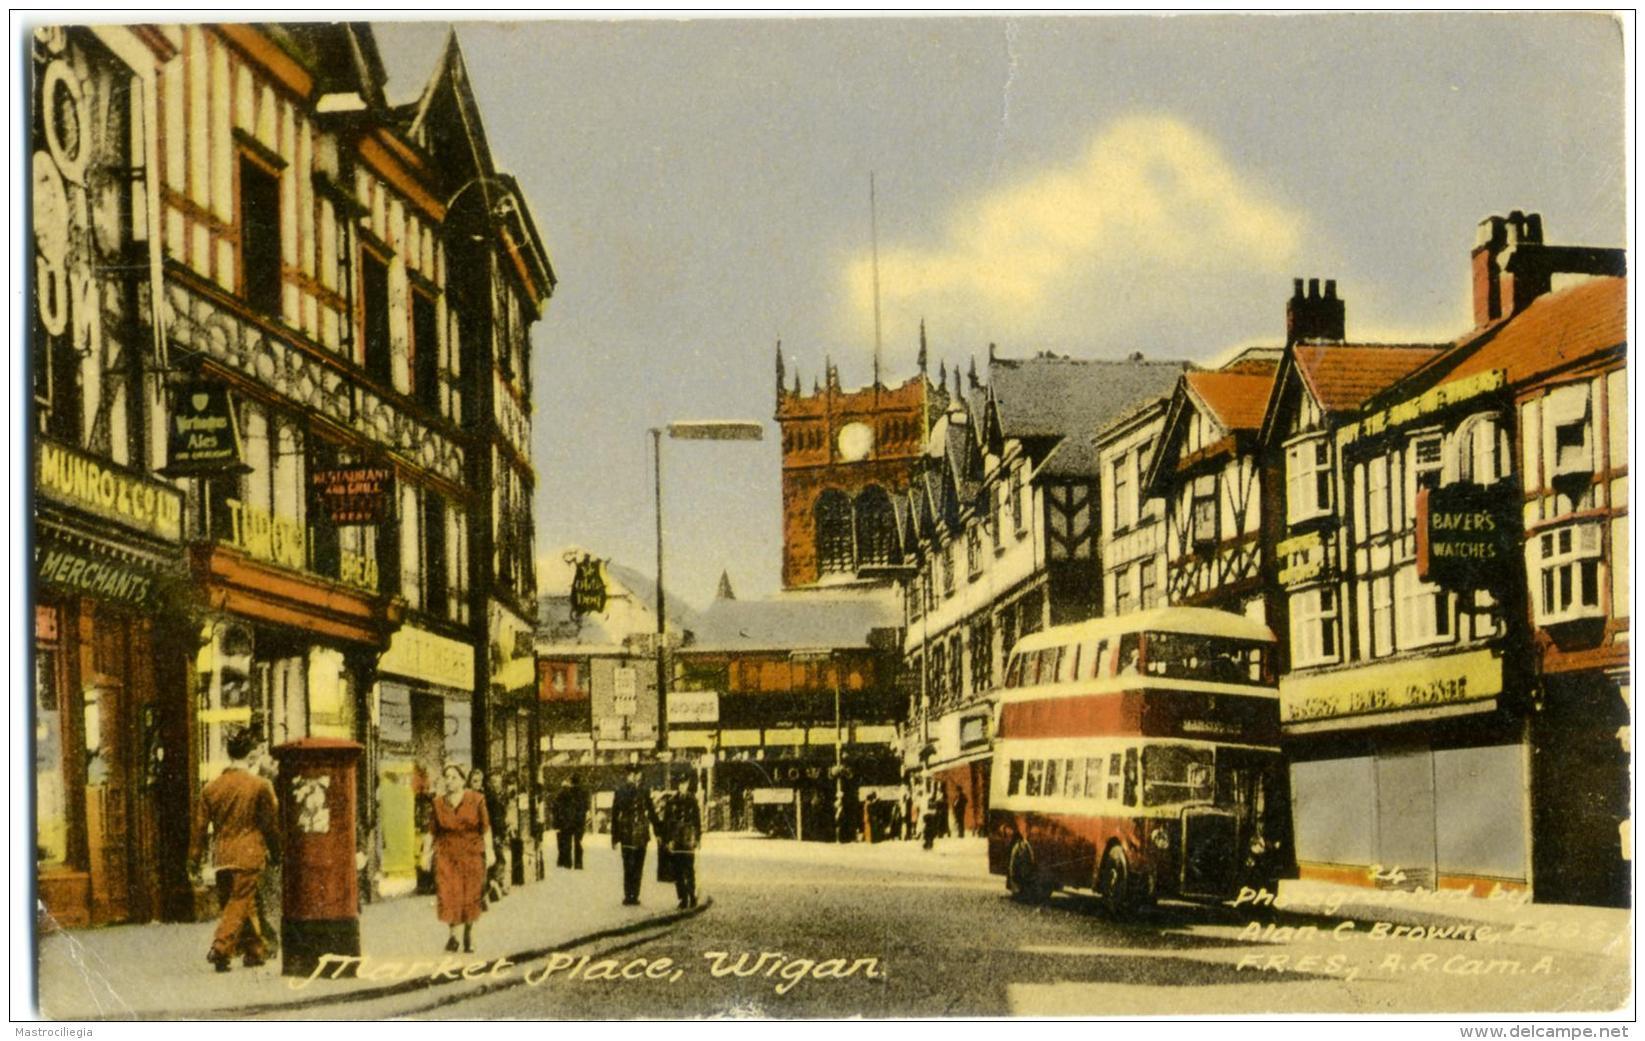 REGNO UNITO  LANCASHIRE  WIGAN  Market Place  Bobbies Policemen  Autobus  Photo Alan C. Browne - Inghilterra